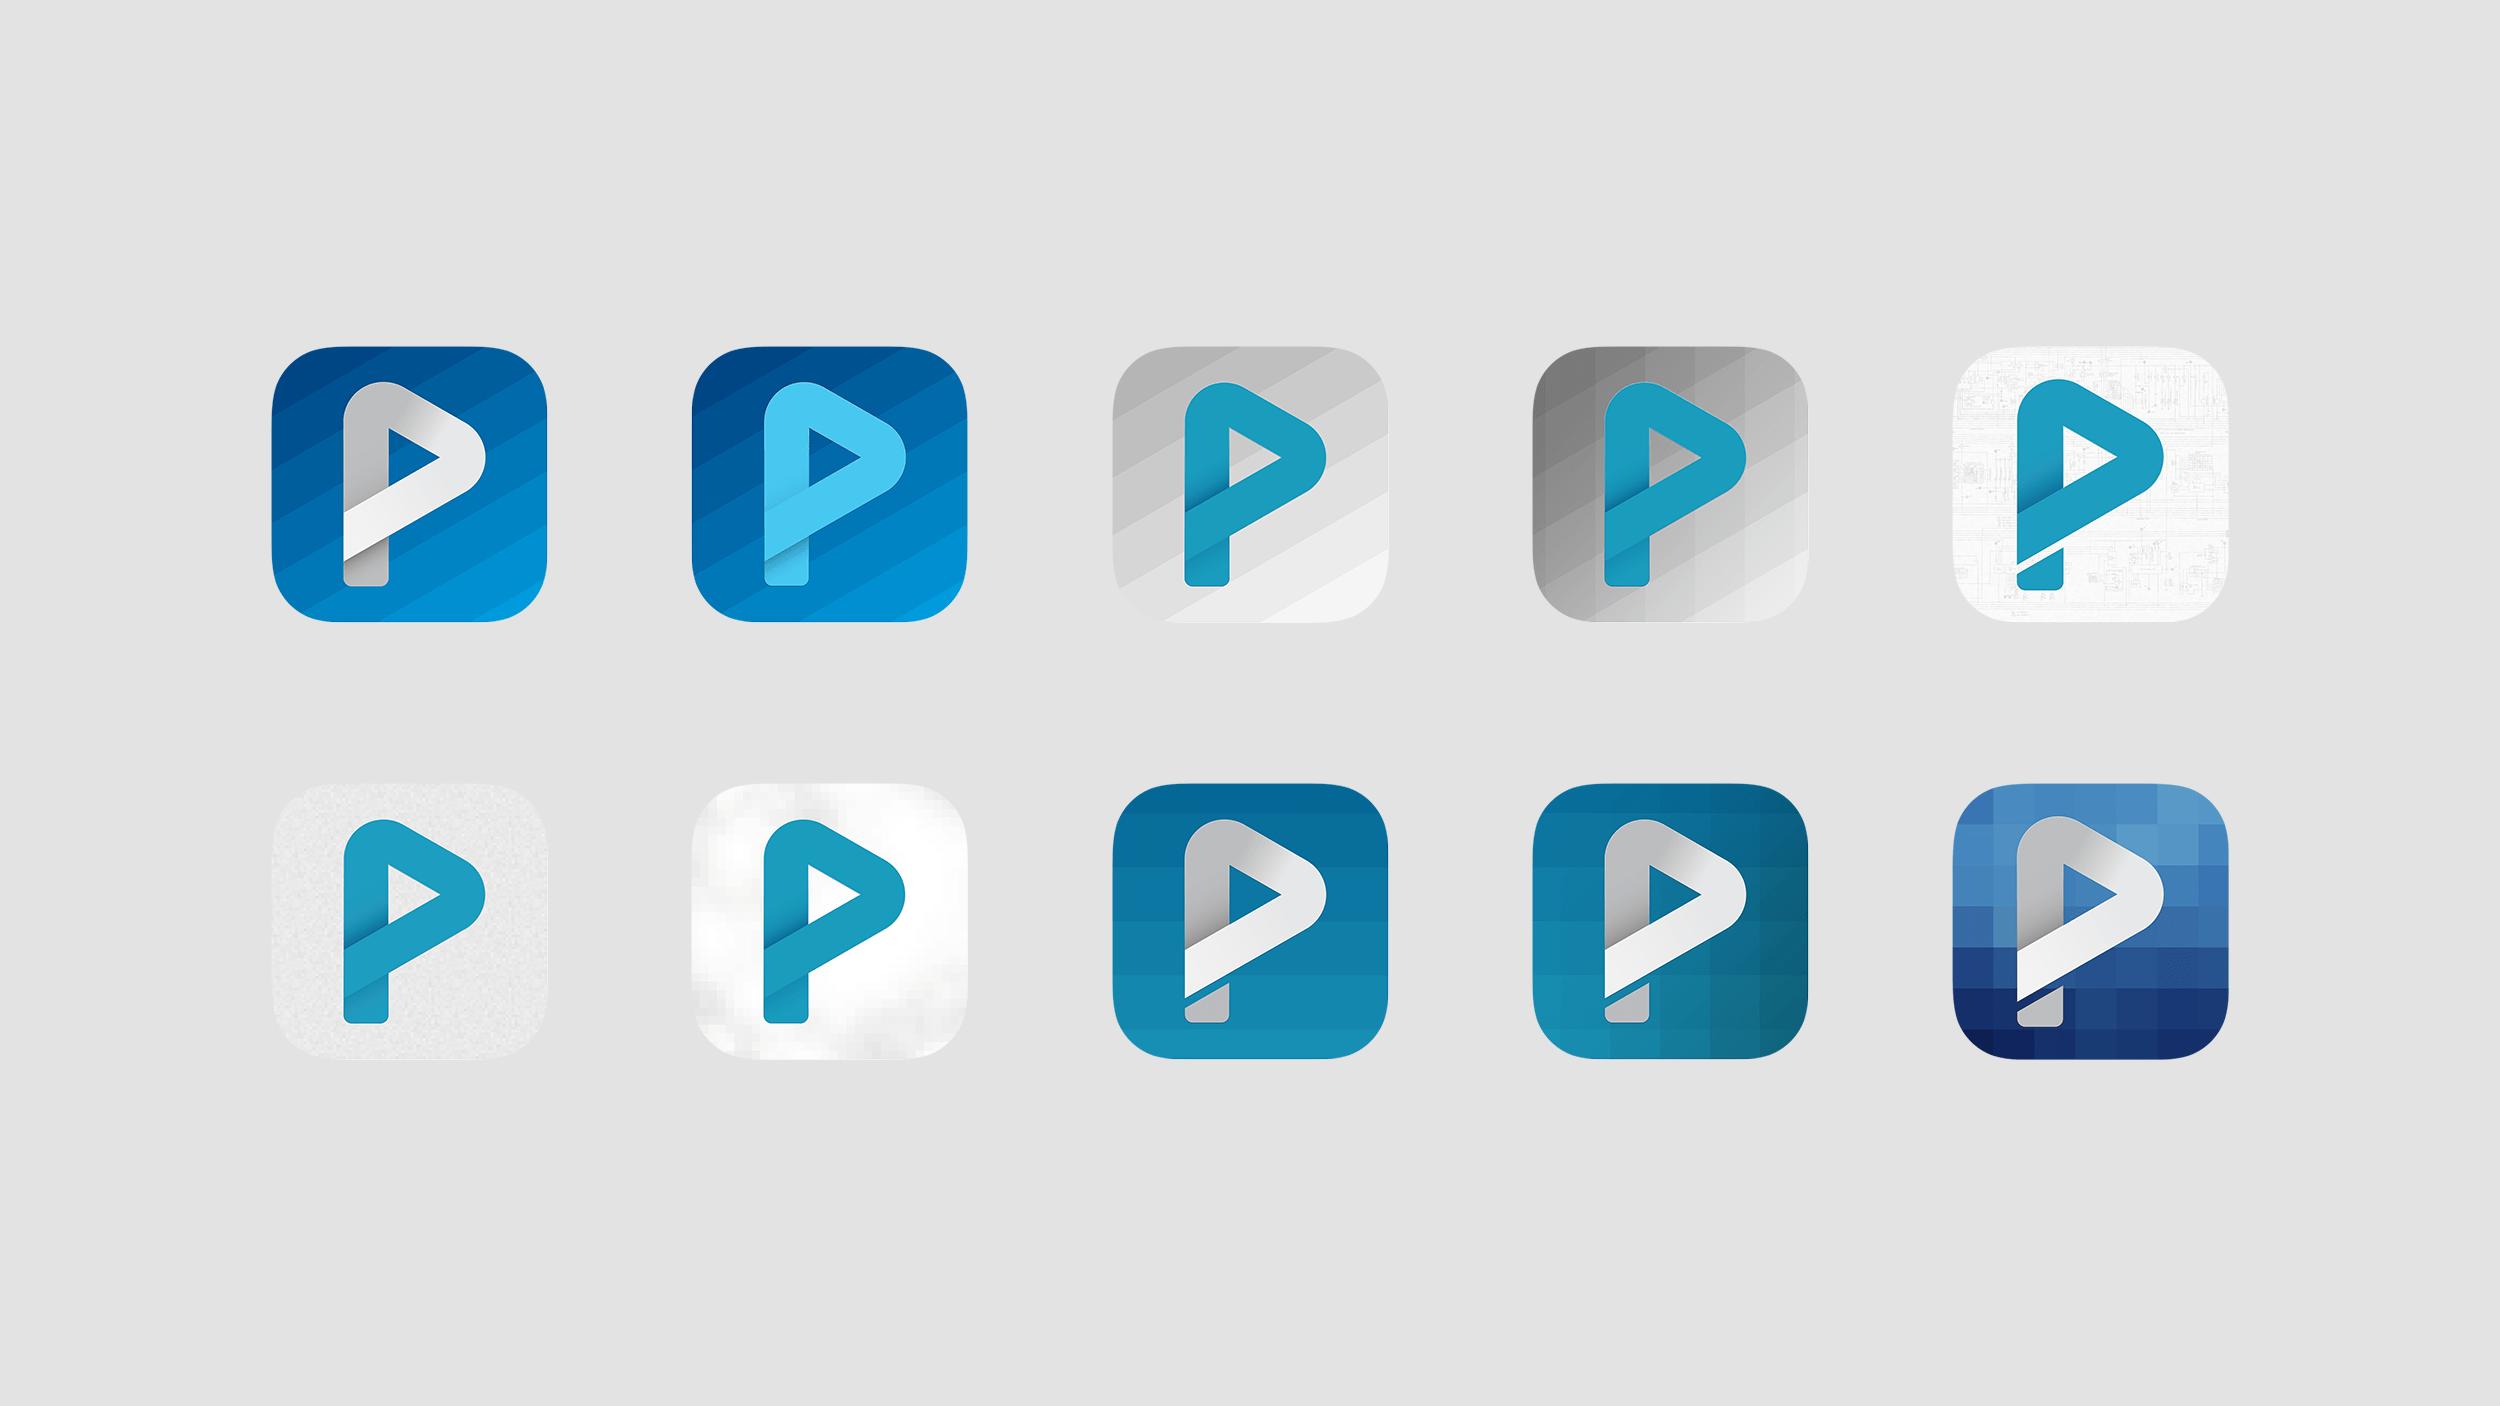 powerplay-appLogos-all-new.png